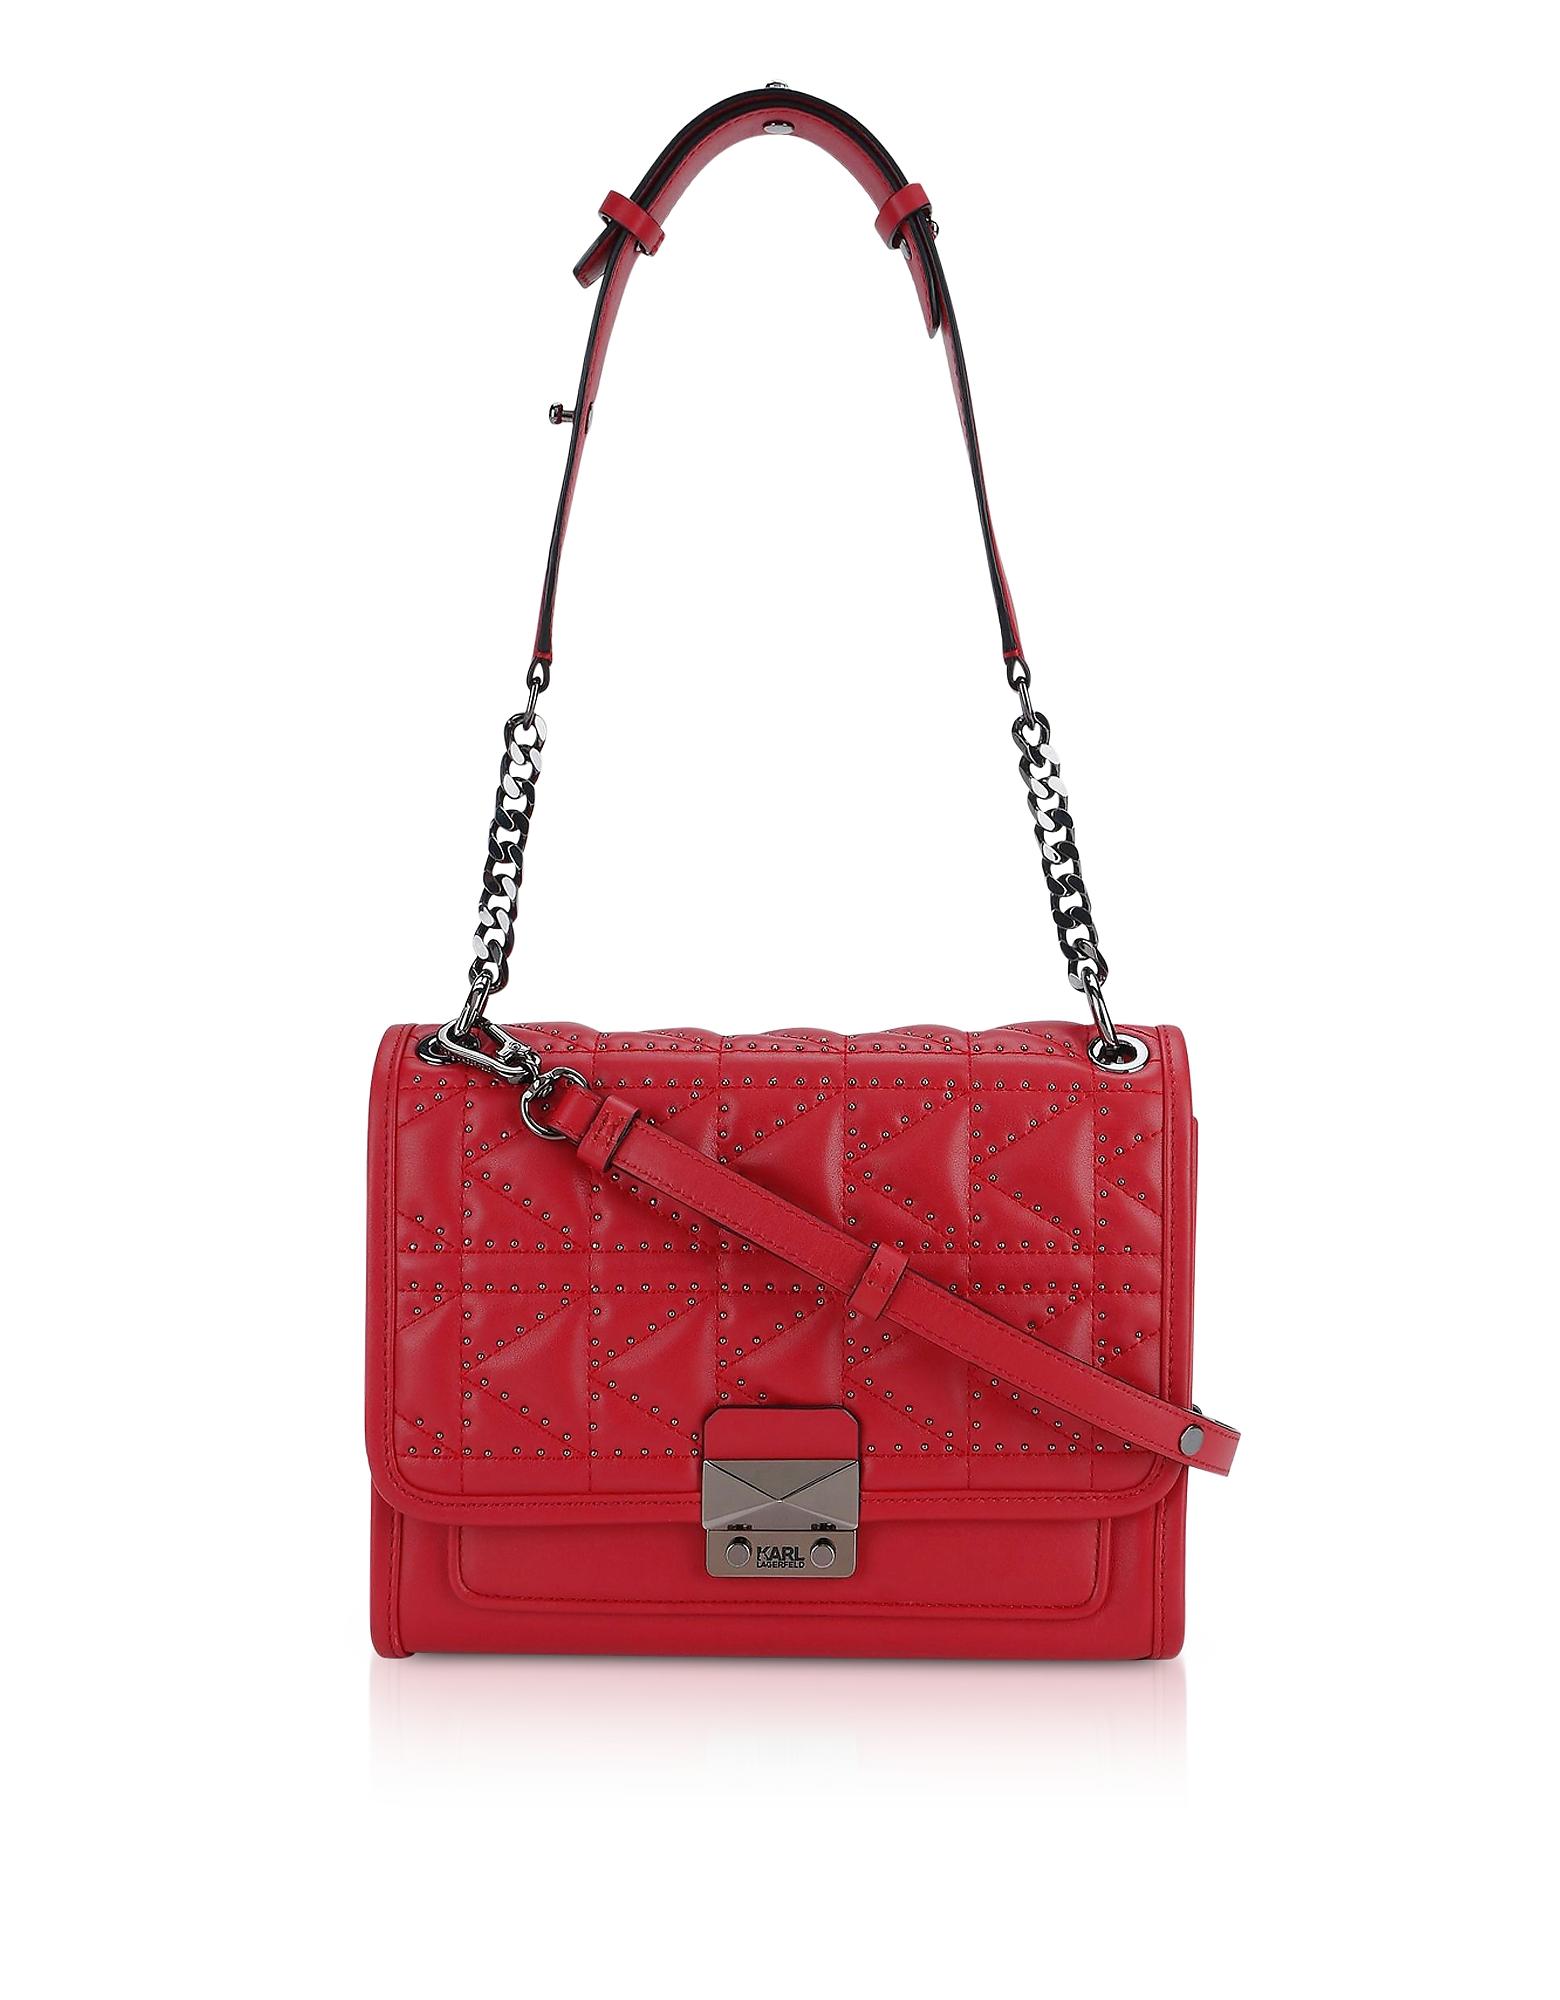 K/Kuilted Rosewood Studs Handbag